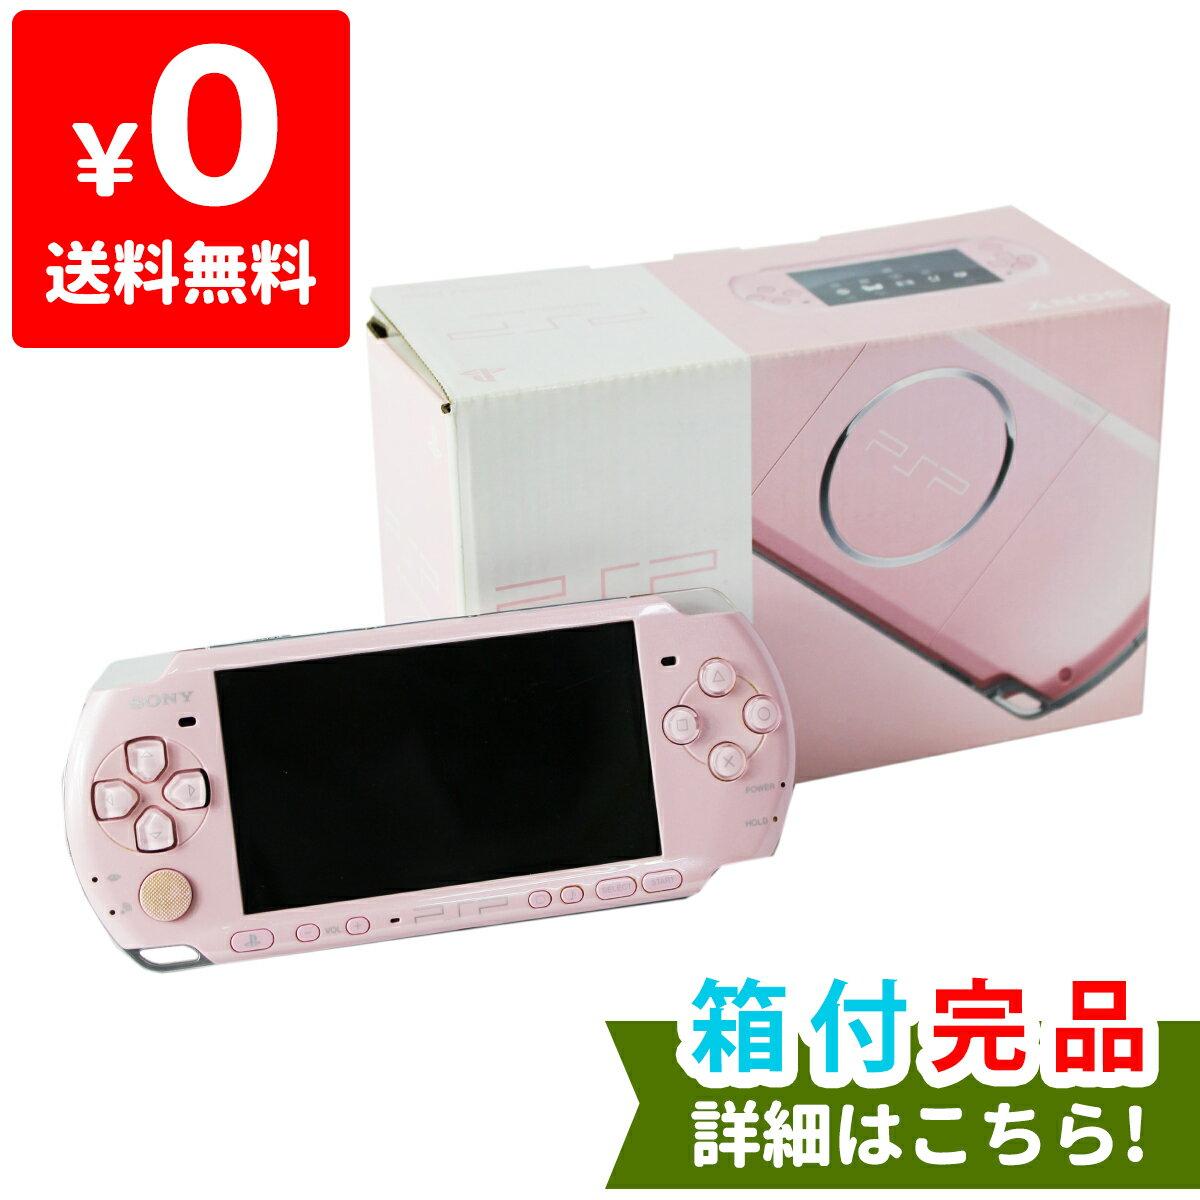 PSP 3000 ブロッサム・ピンク (PSP-3000ZP) 本体 完品 外箱付き PlayStationPortable SONY ソニー 中古 4948872412667 送料無料 【中古】